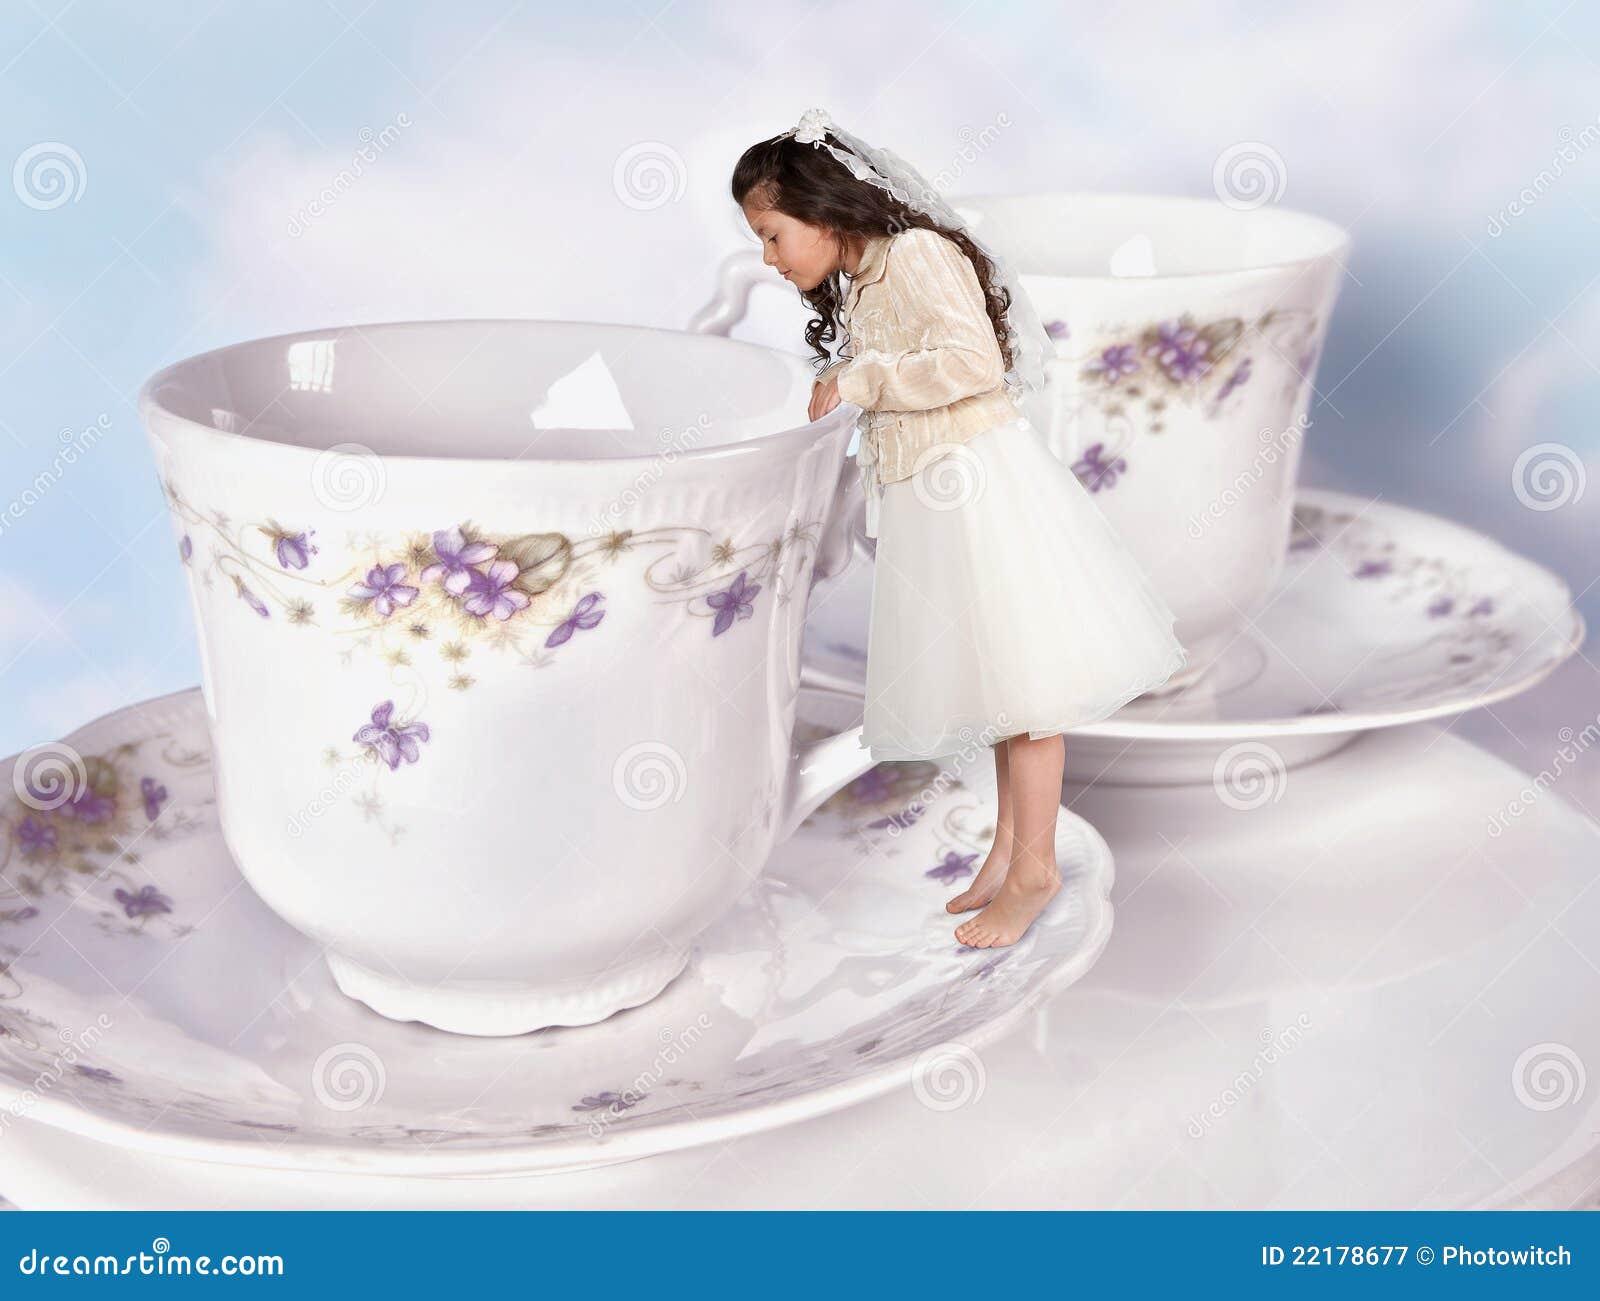 shrunken women in a giantess cup of tea